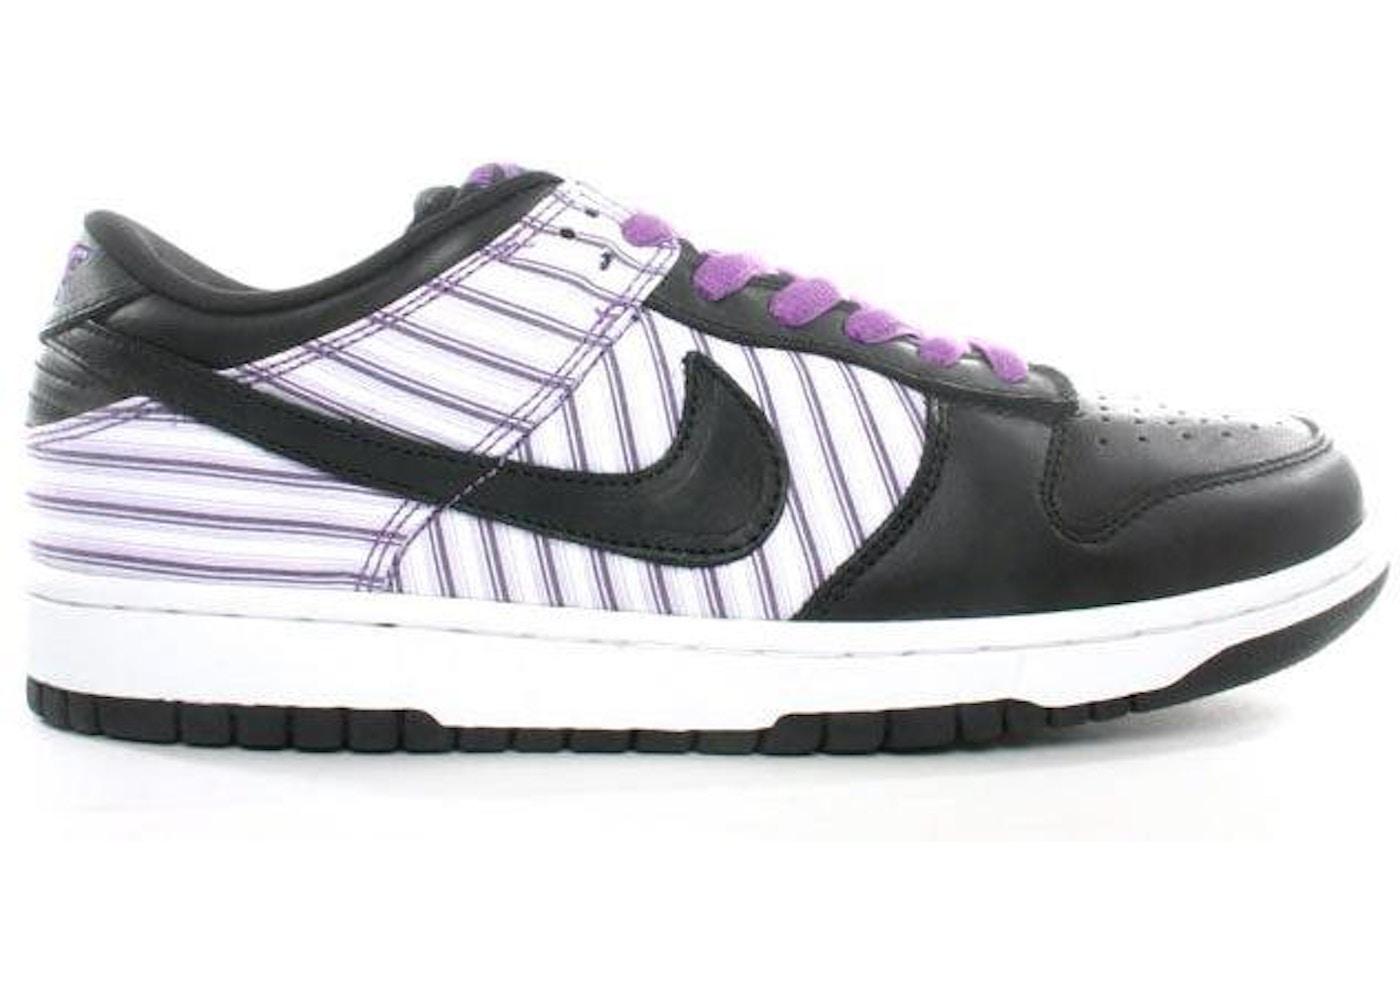 official photos 0d678 f62da Nike Dunk SB Low Avenger Purple